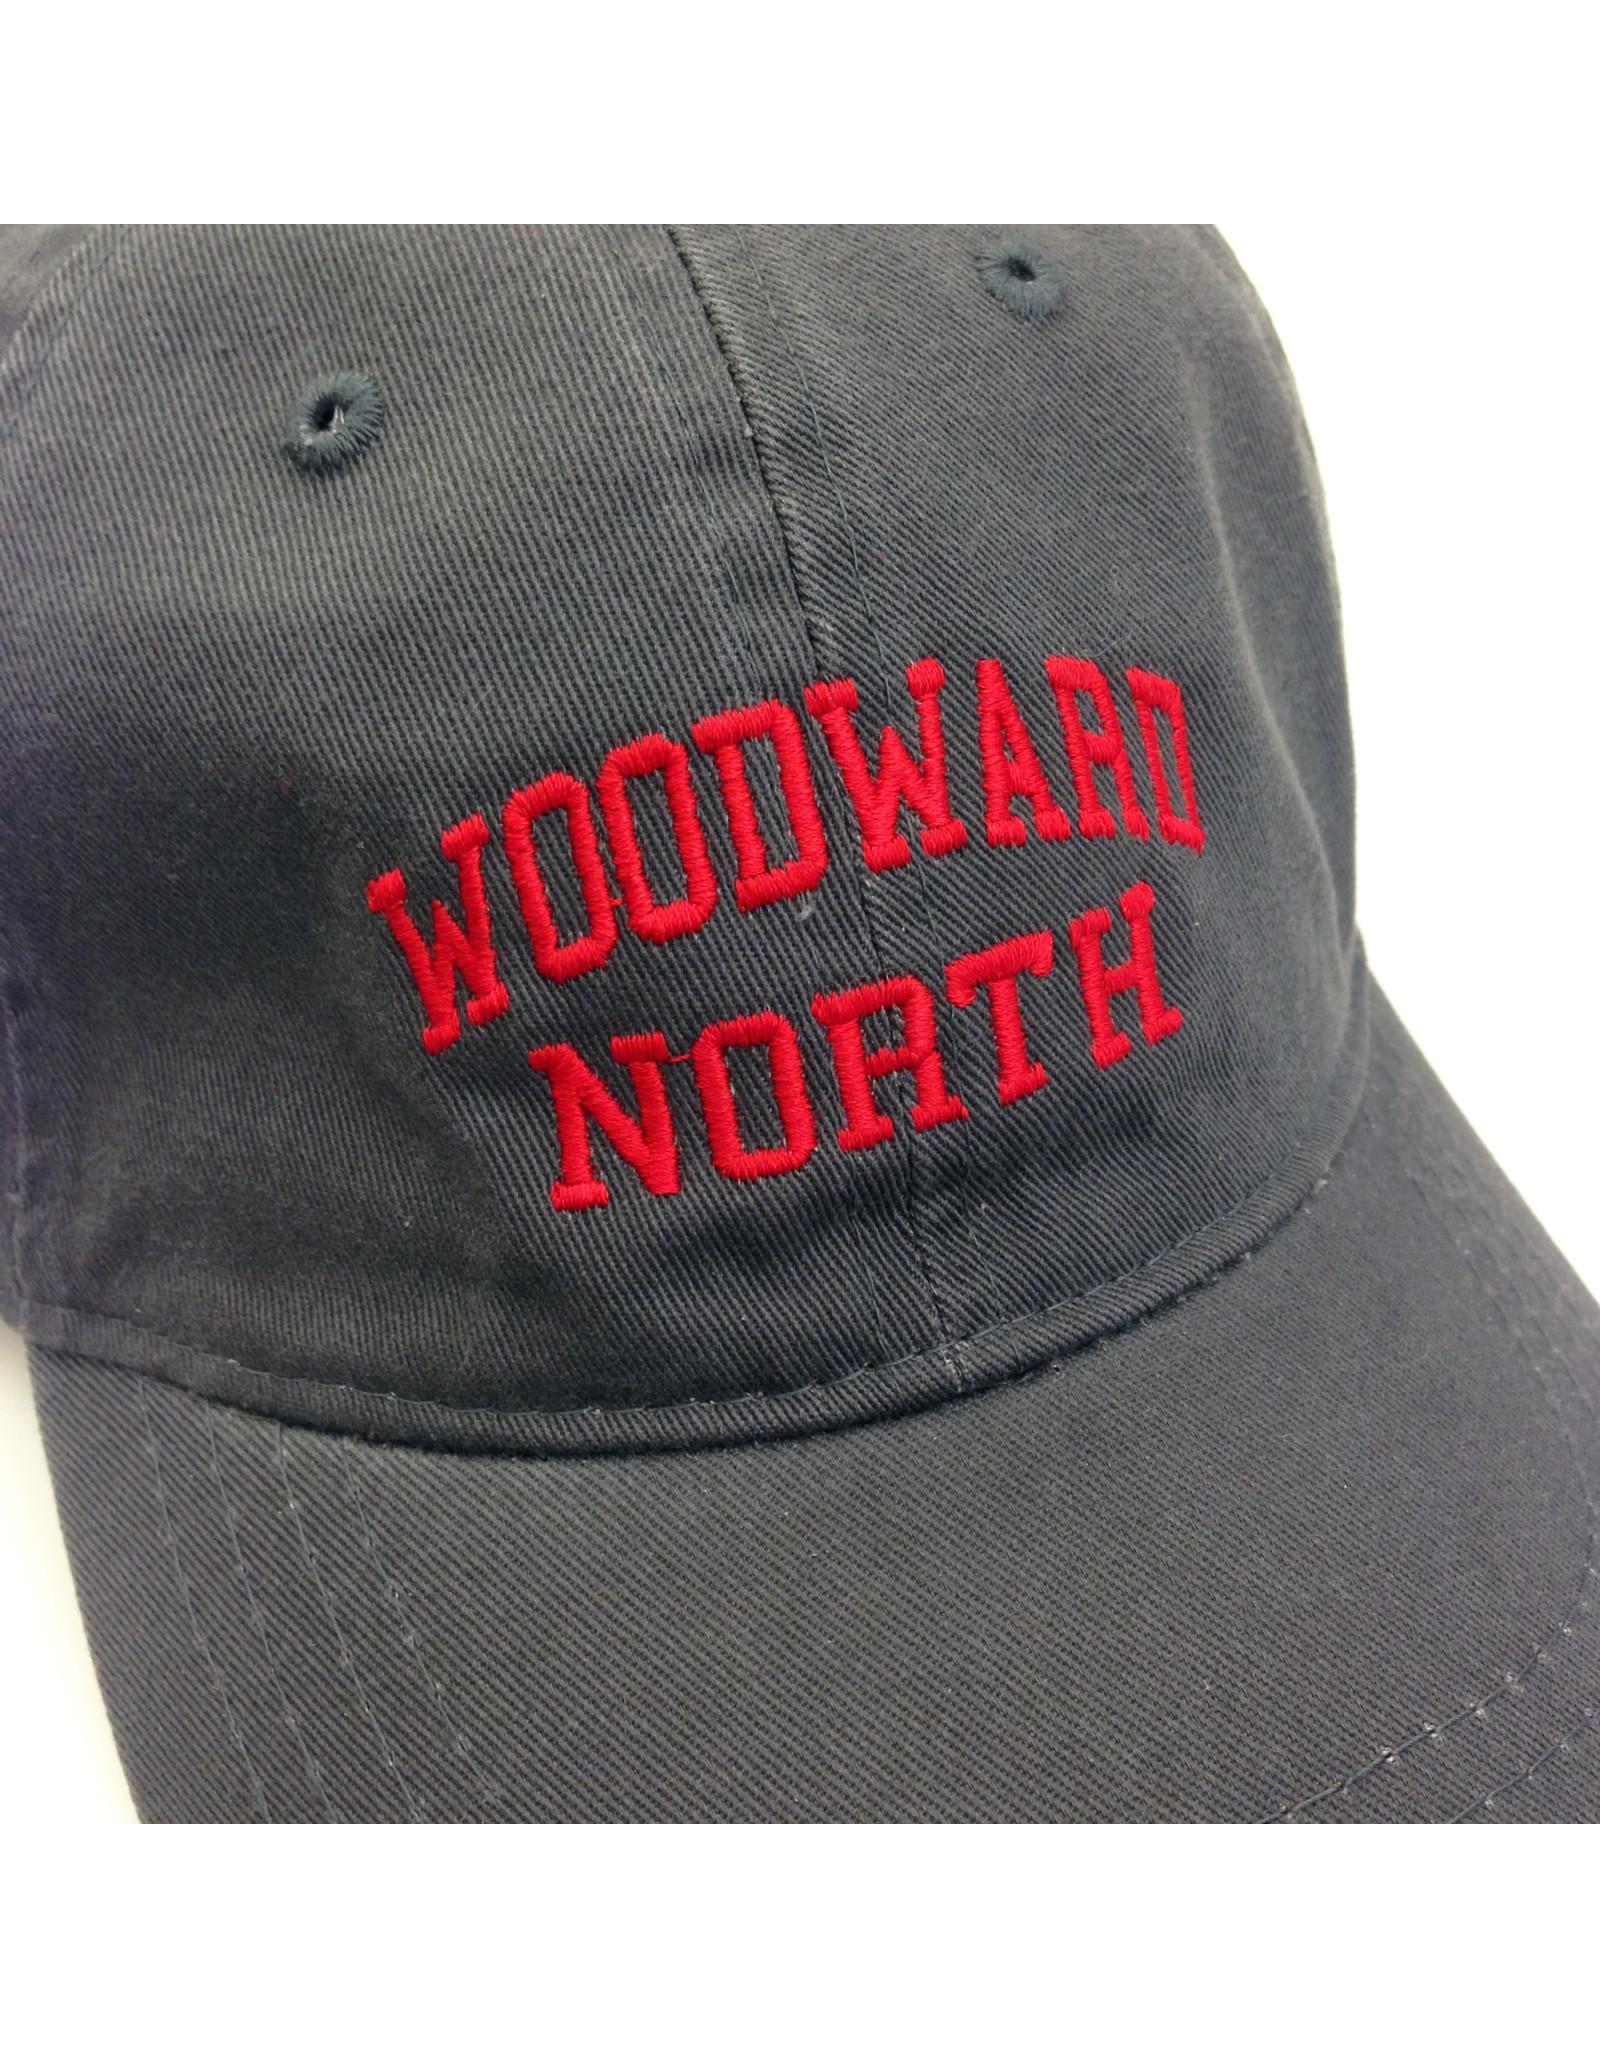 CAP Woodward North Adjustable Grey Cotton Twill